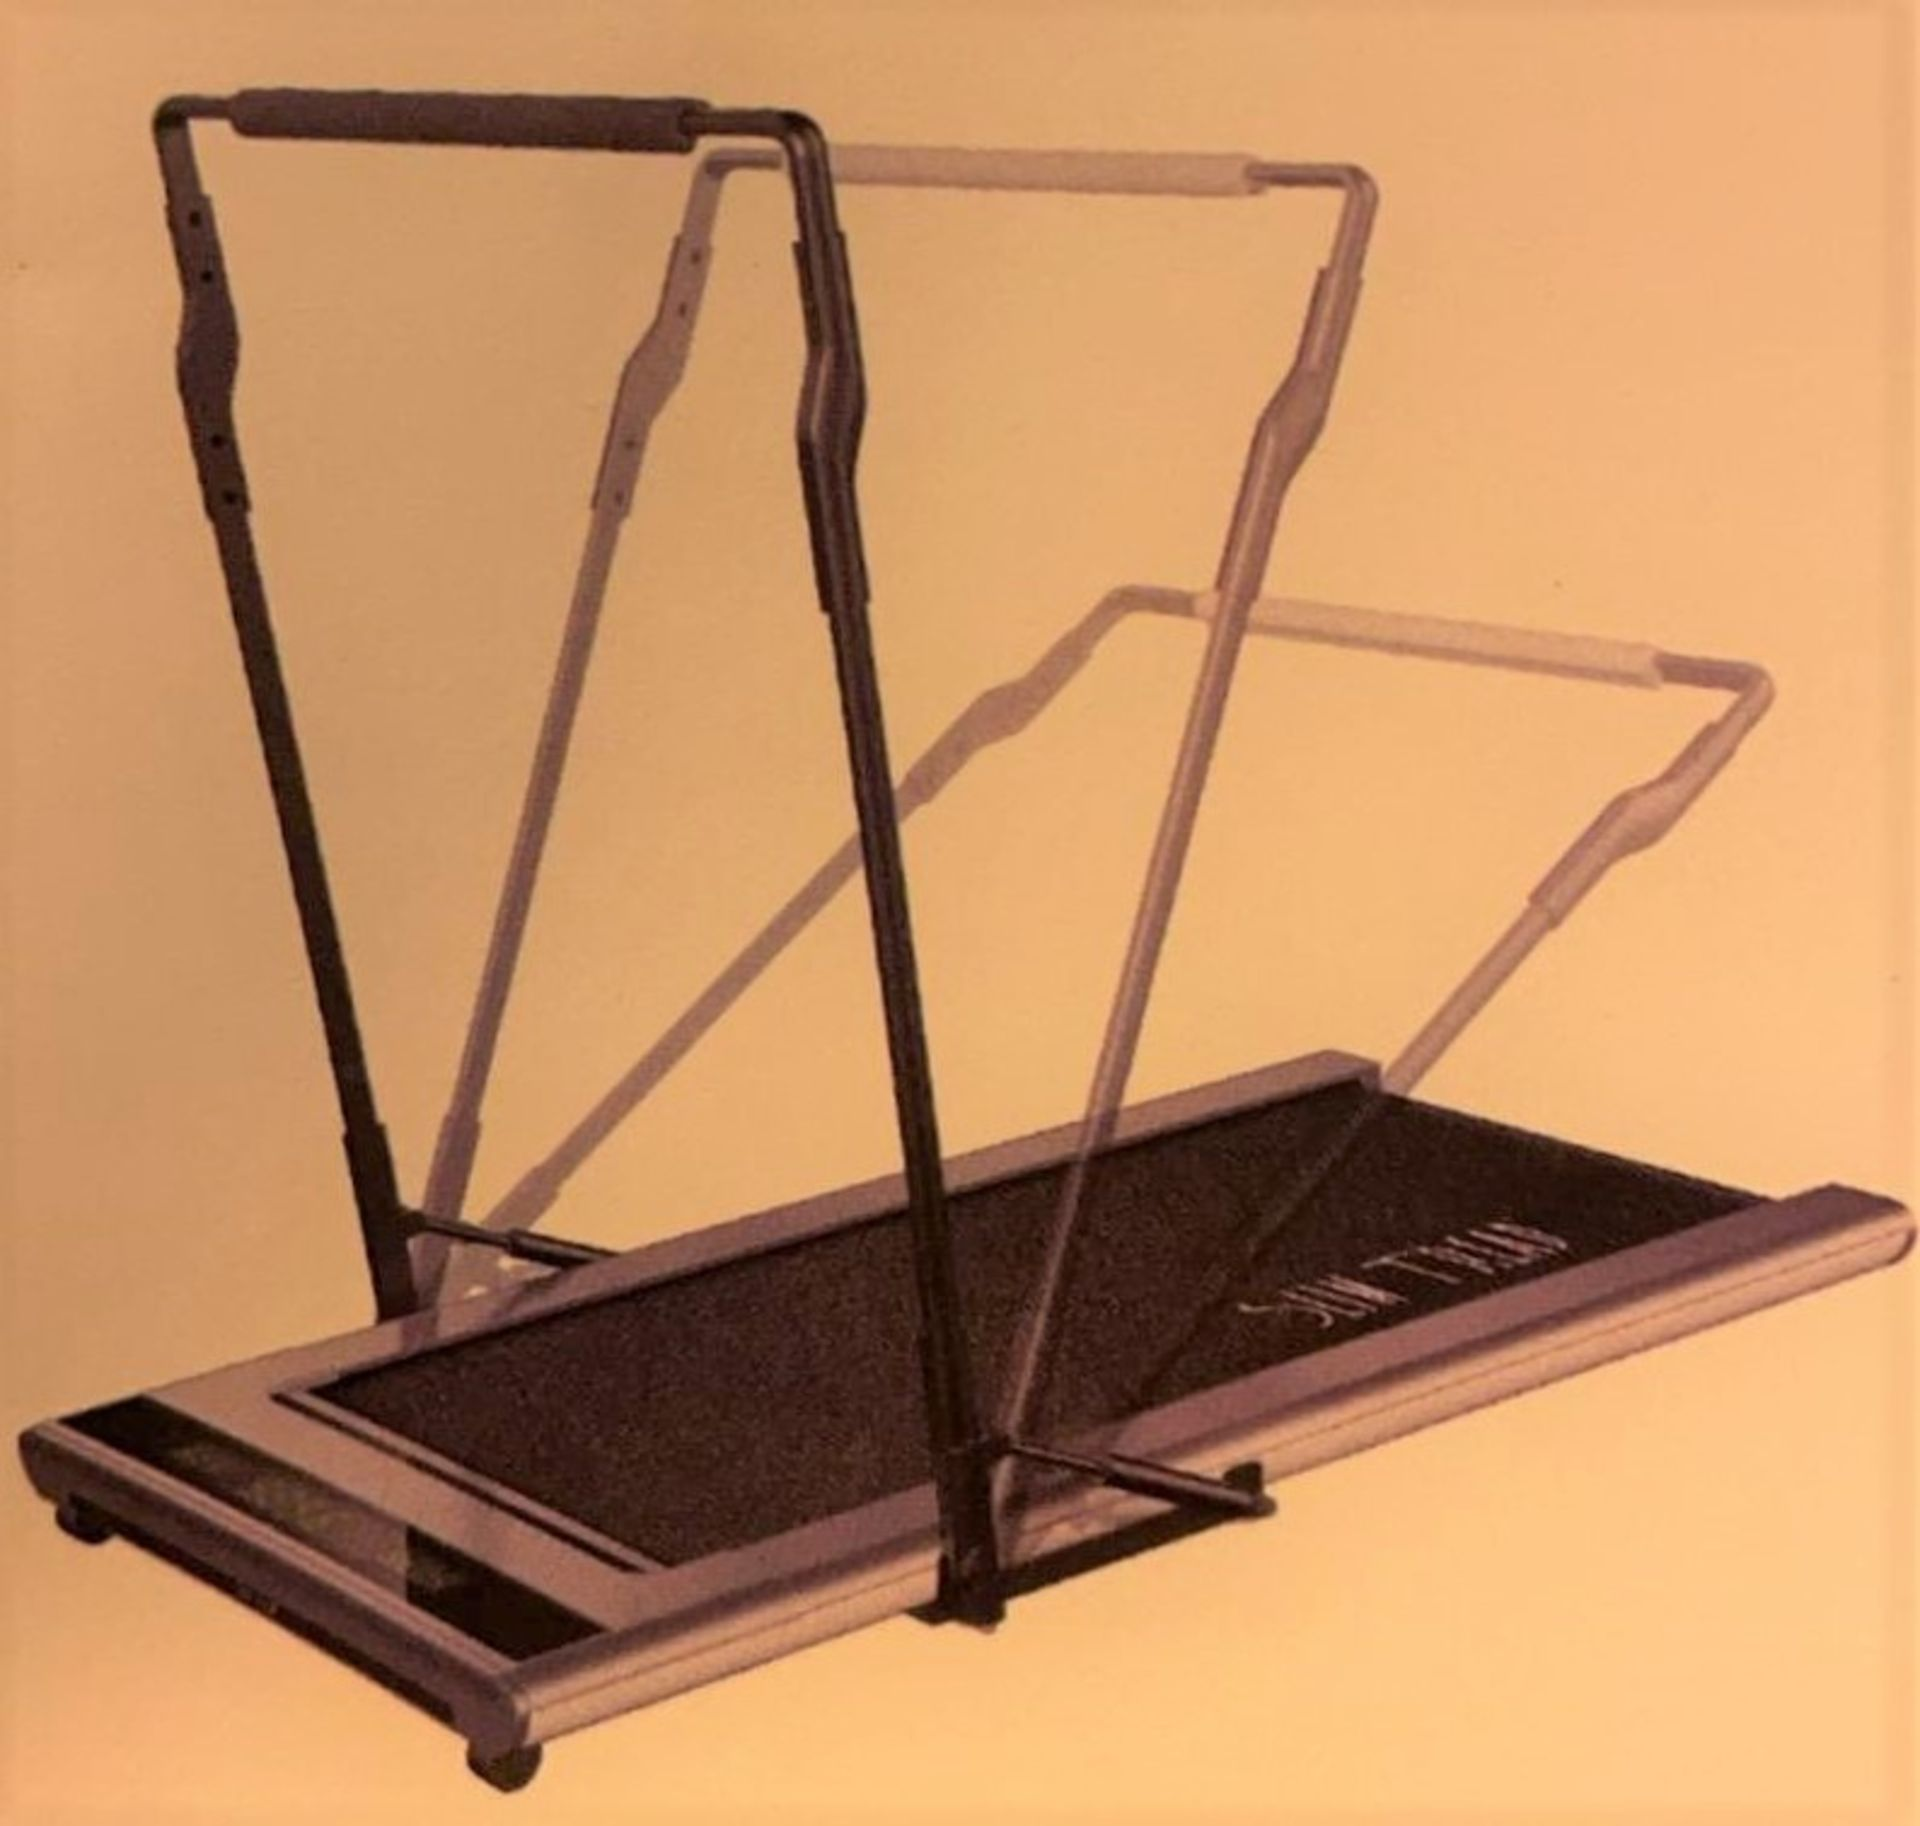 1 x Slim Tread Ultra Thin Smart Treadmill Running / Walking Machine - Lightweight With Folding - Image 10 of 19